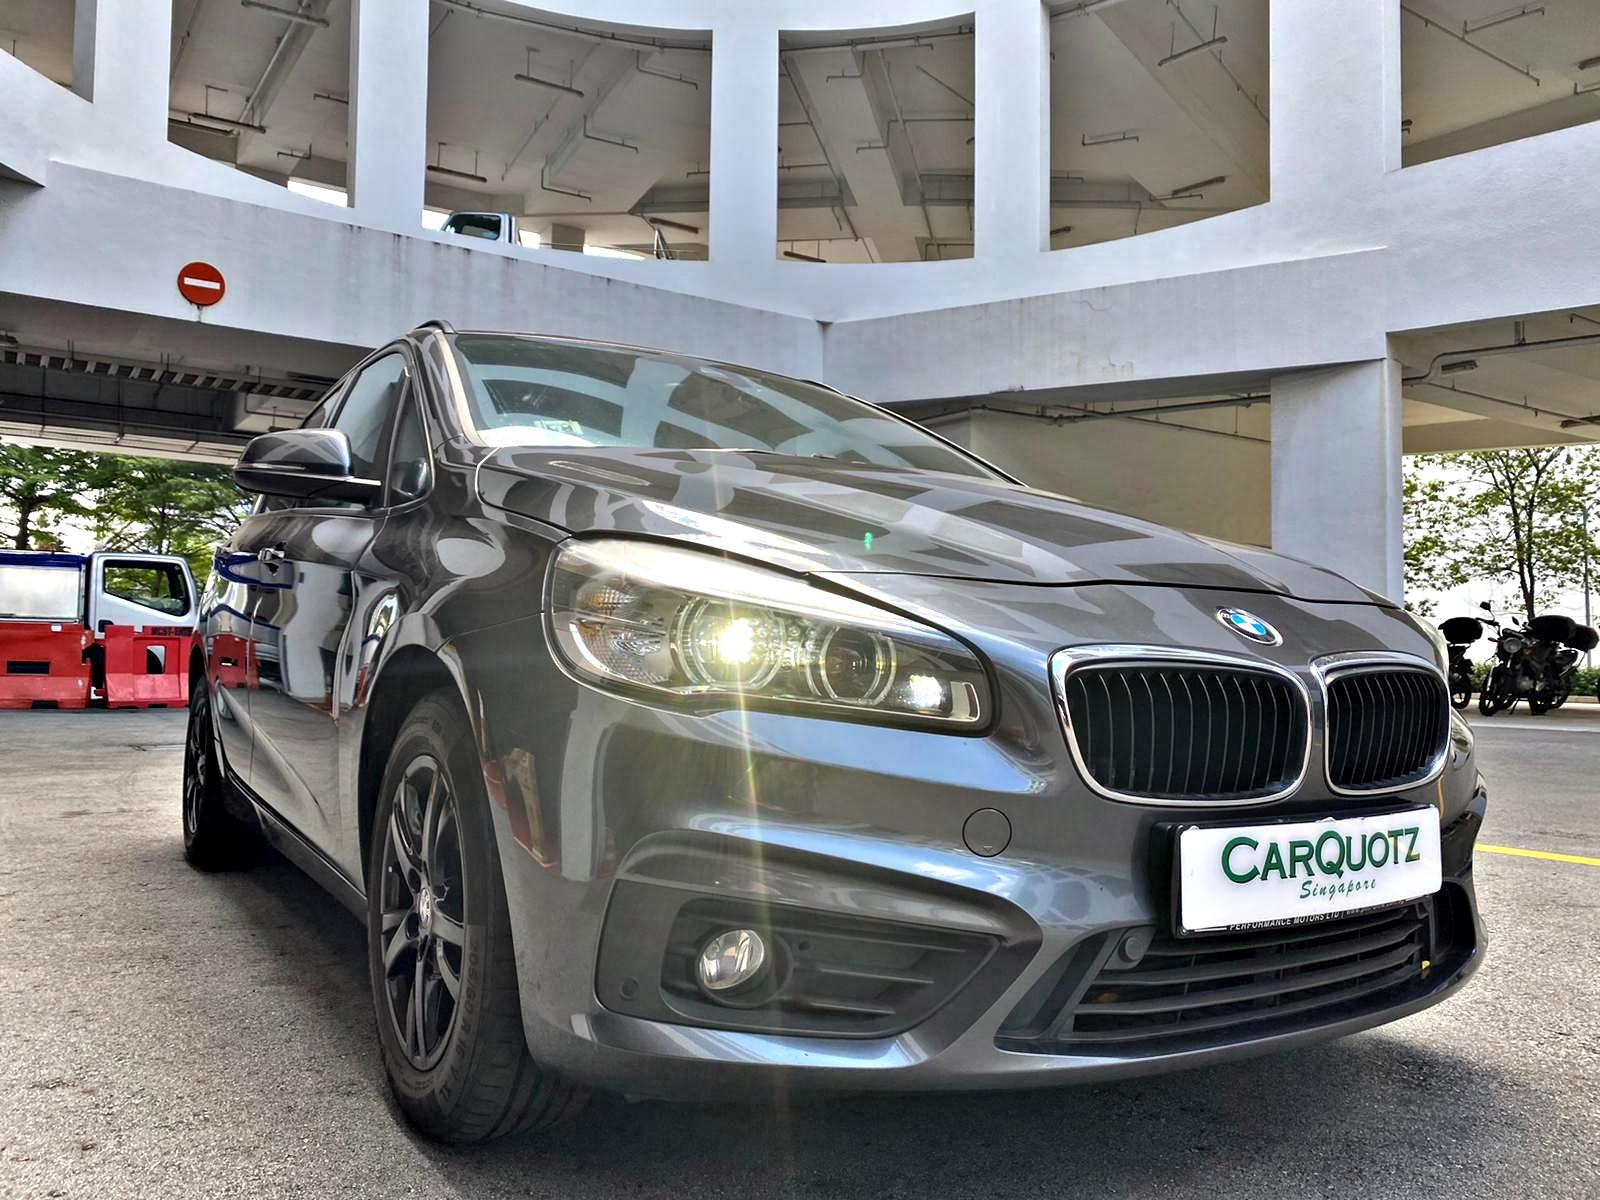 BMW 2 Series 216d Diesel (For Rent)